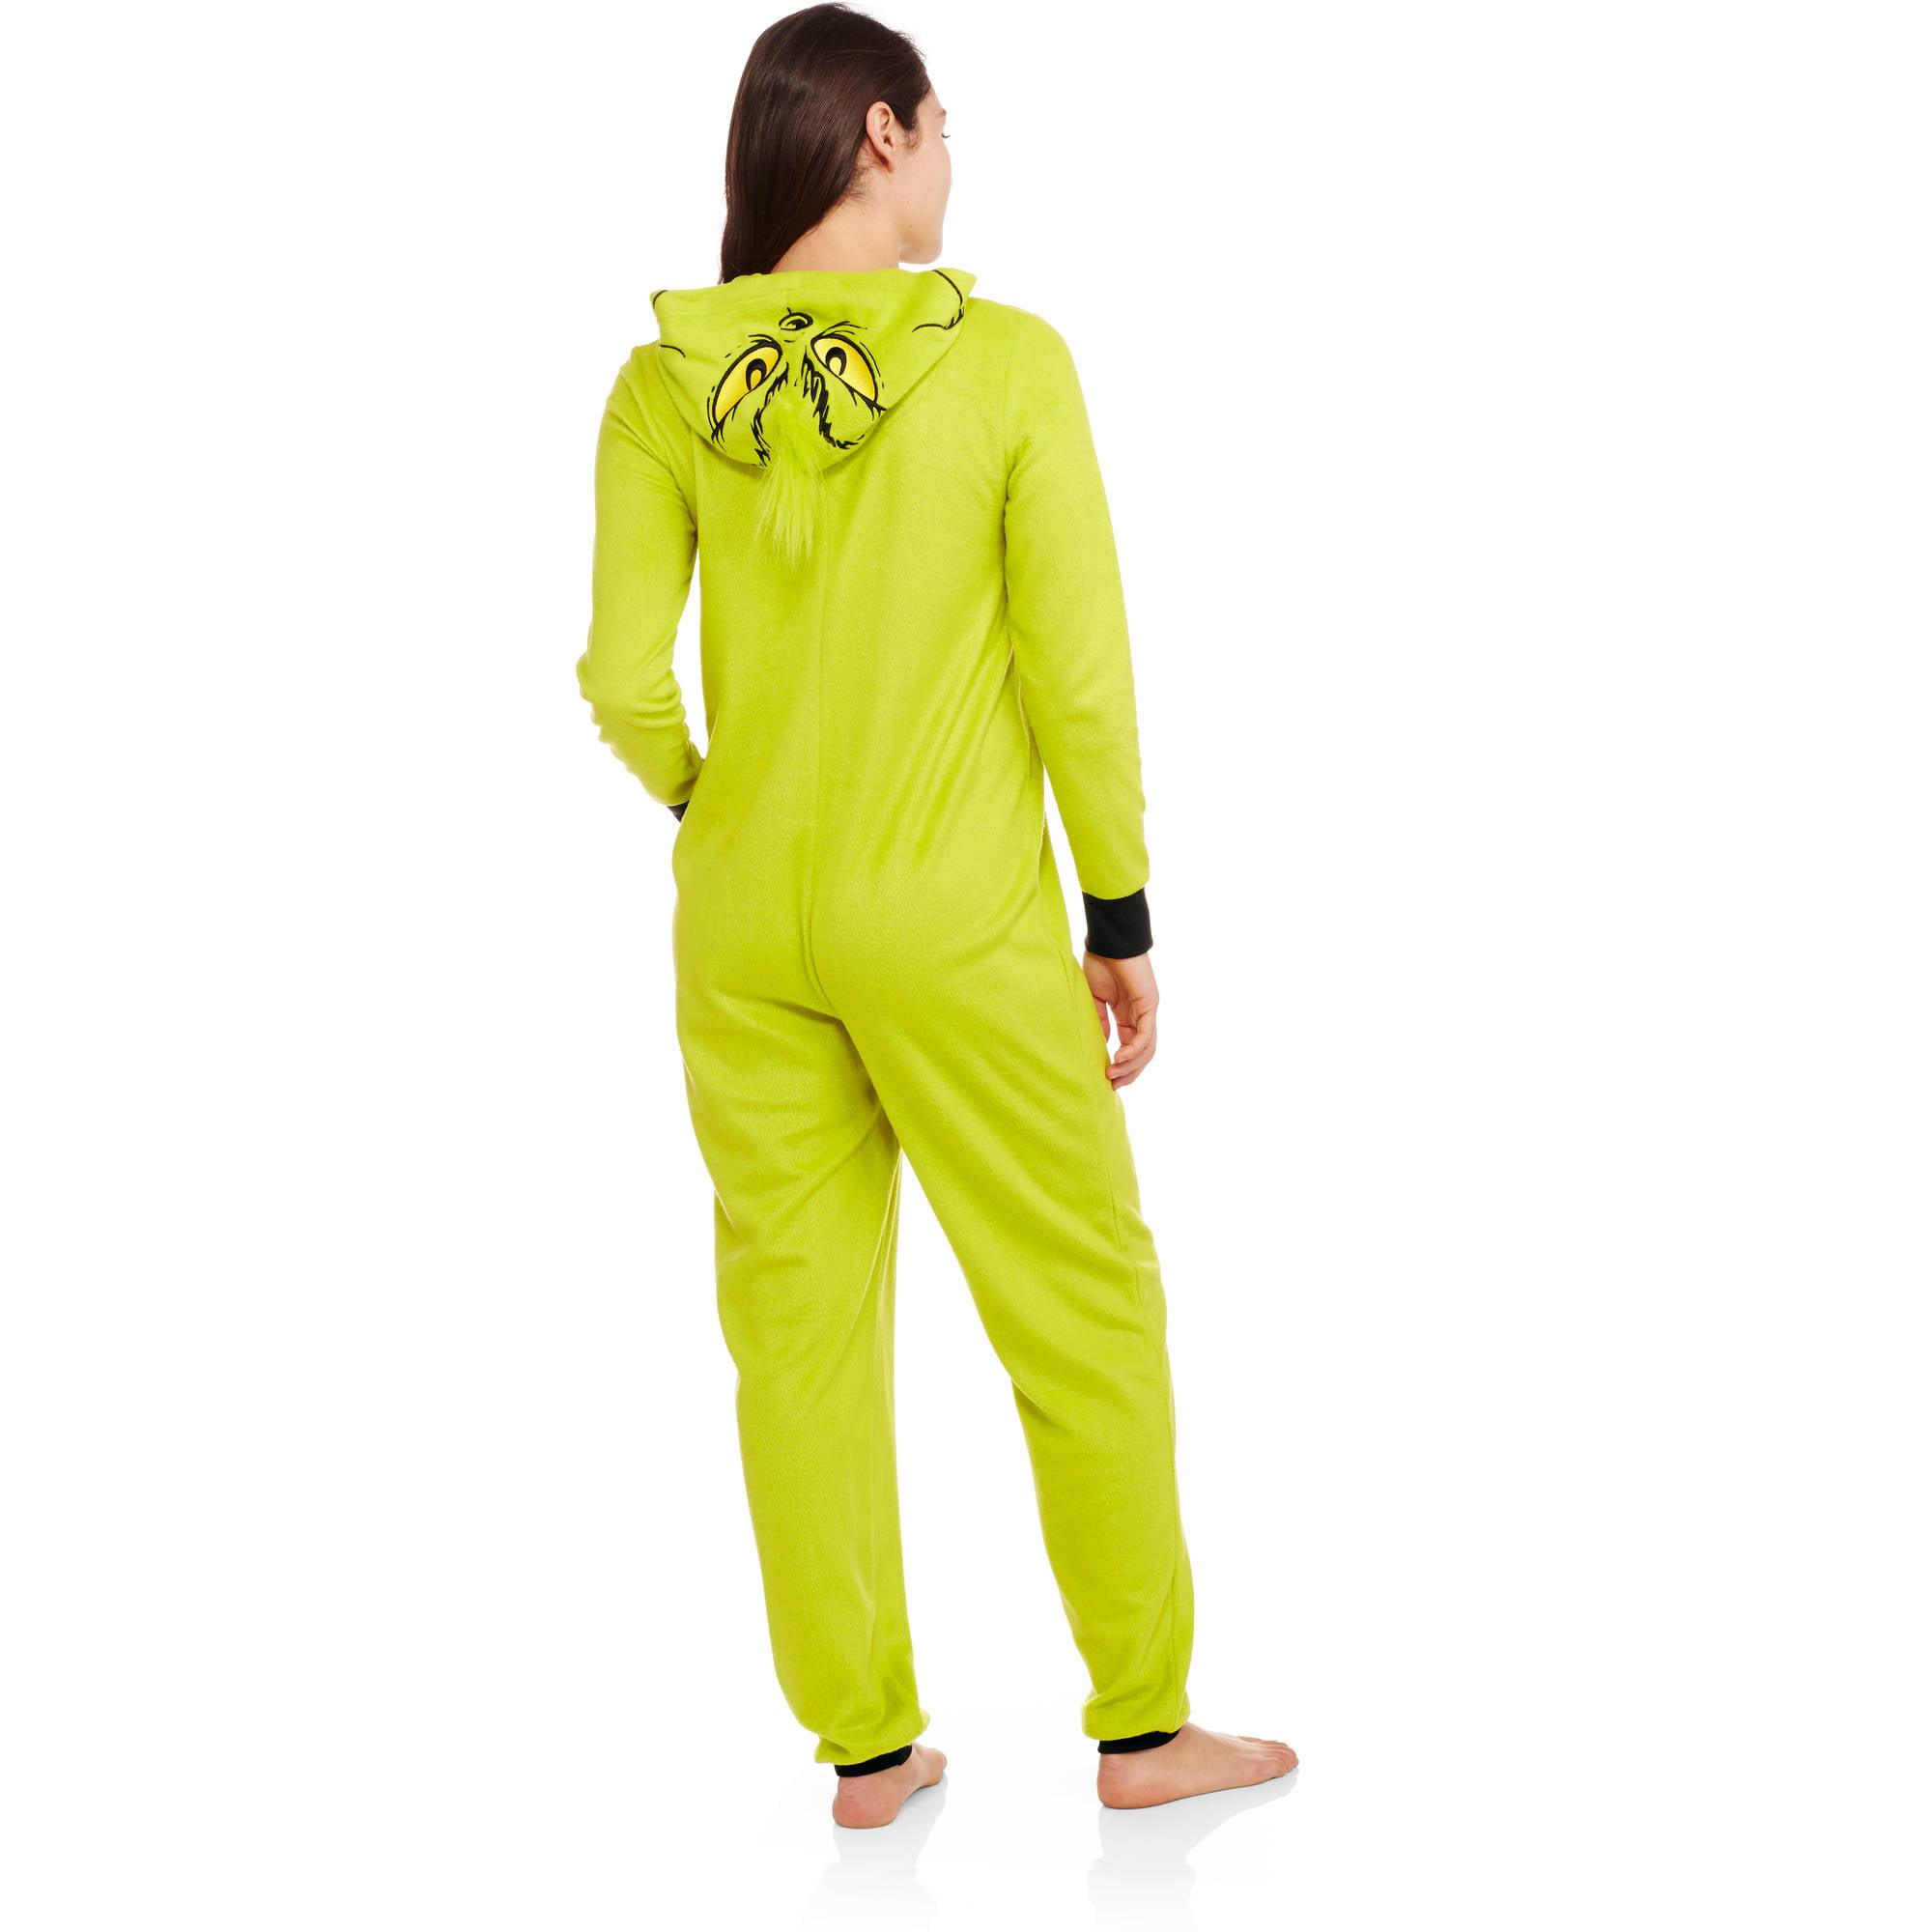 60027338e Licensed - Grinch Women s Sleepwear Adult Onesie Costume Union Suit ...